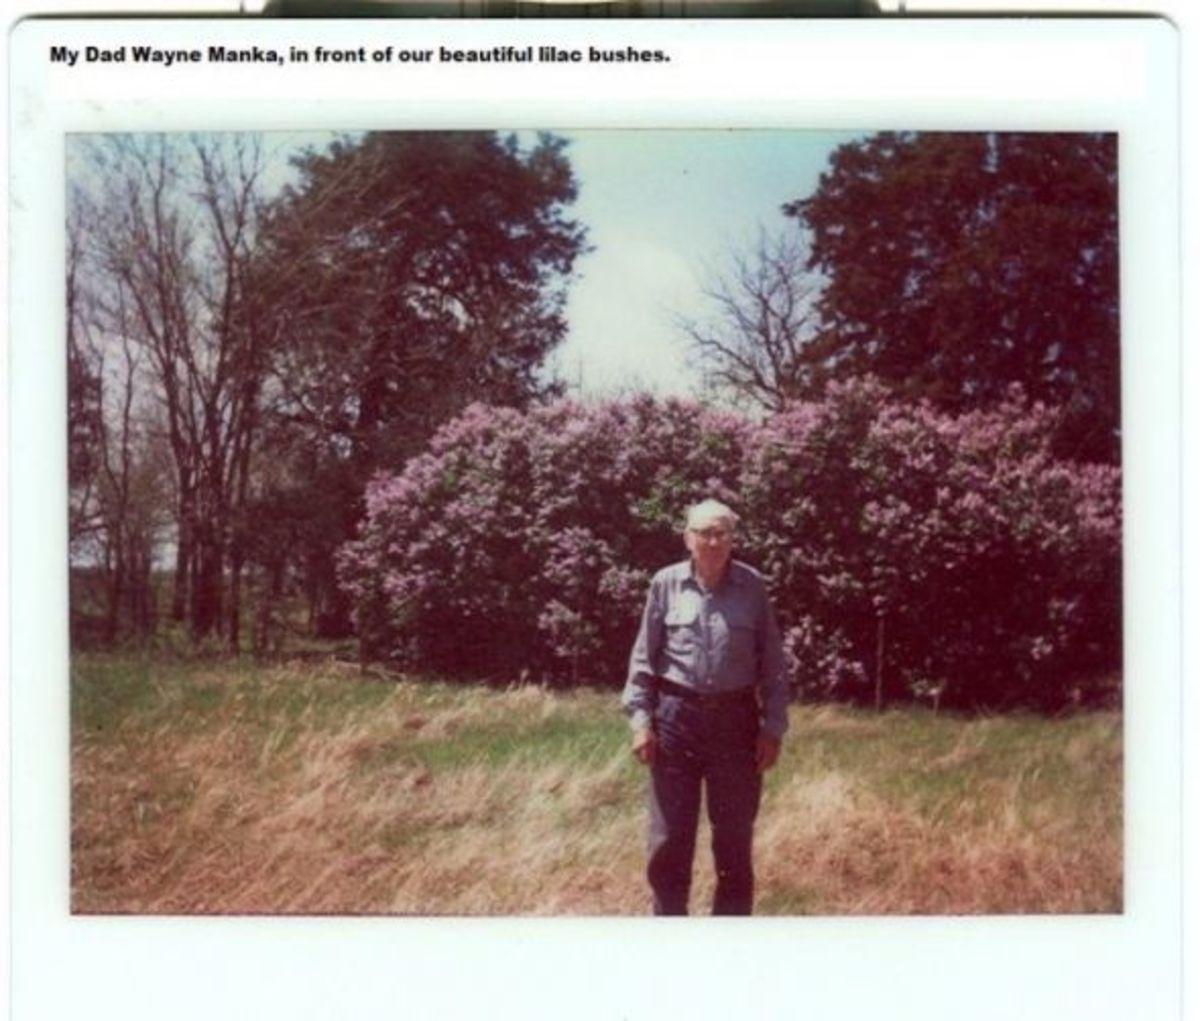 Wayne Manka (note the lush lilac bushes)